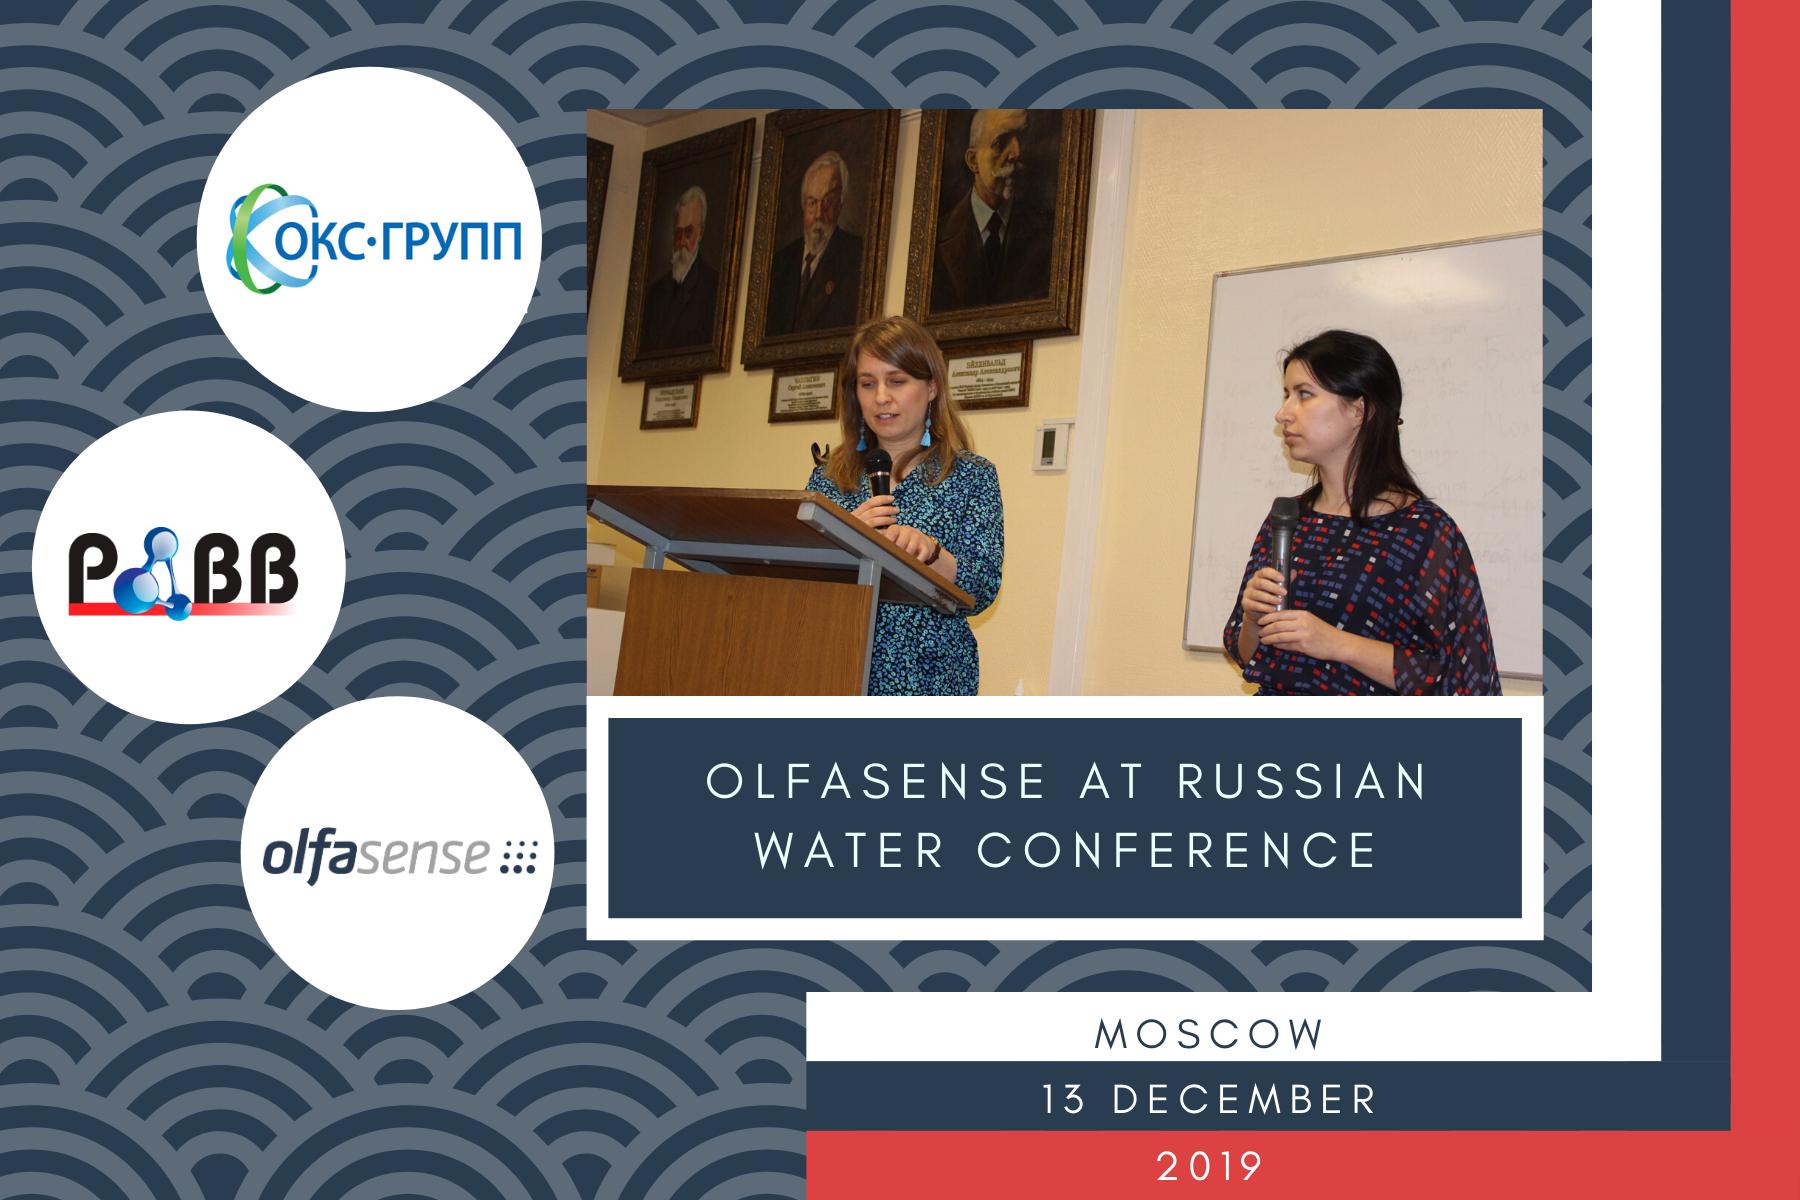 Olfasense Russia Water